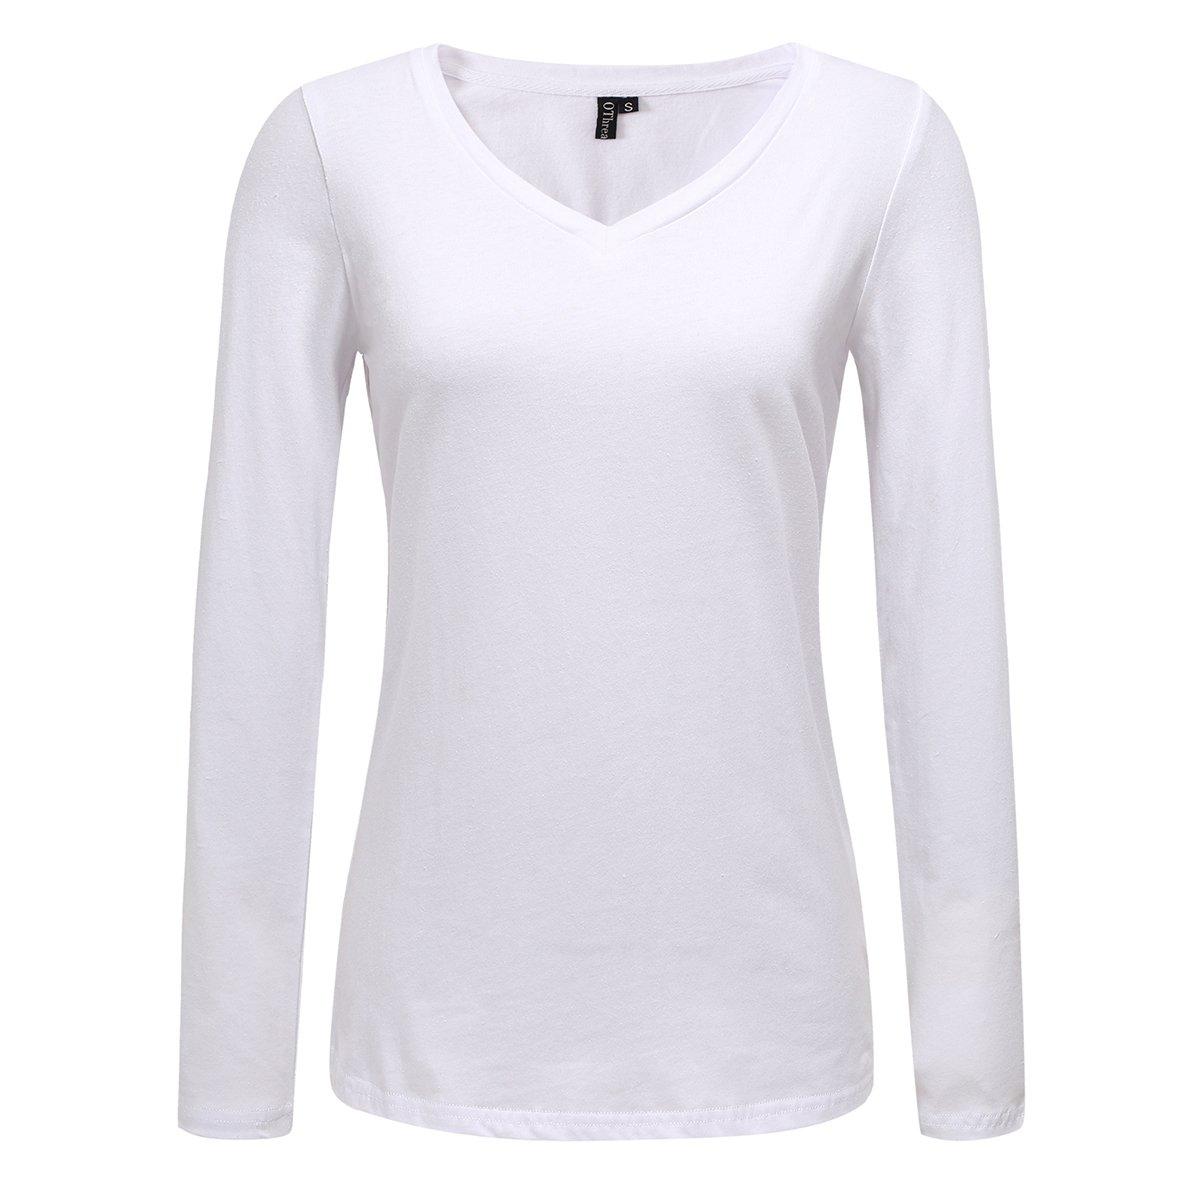 OThread & Co. Women's Long Sleeve T-Shirt 100% Cotton Basic Casual V-Neck Tee (Small, White)